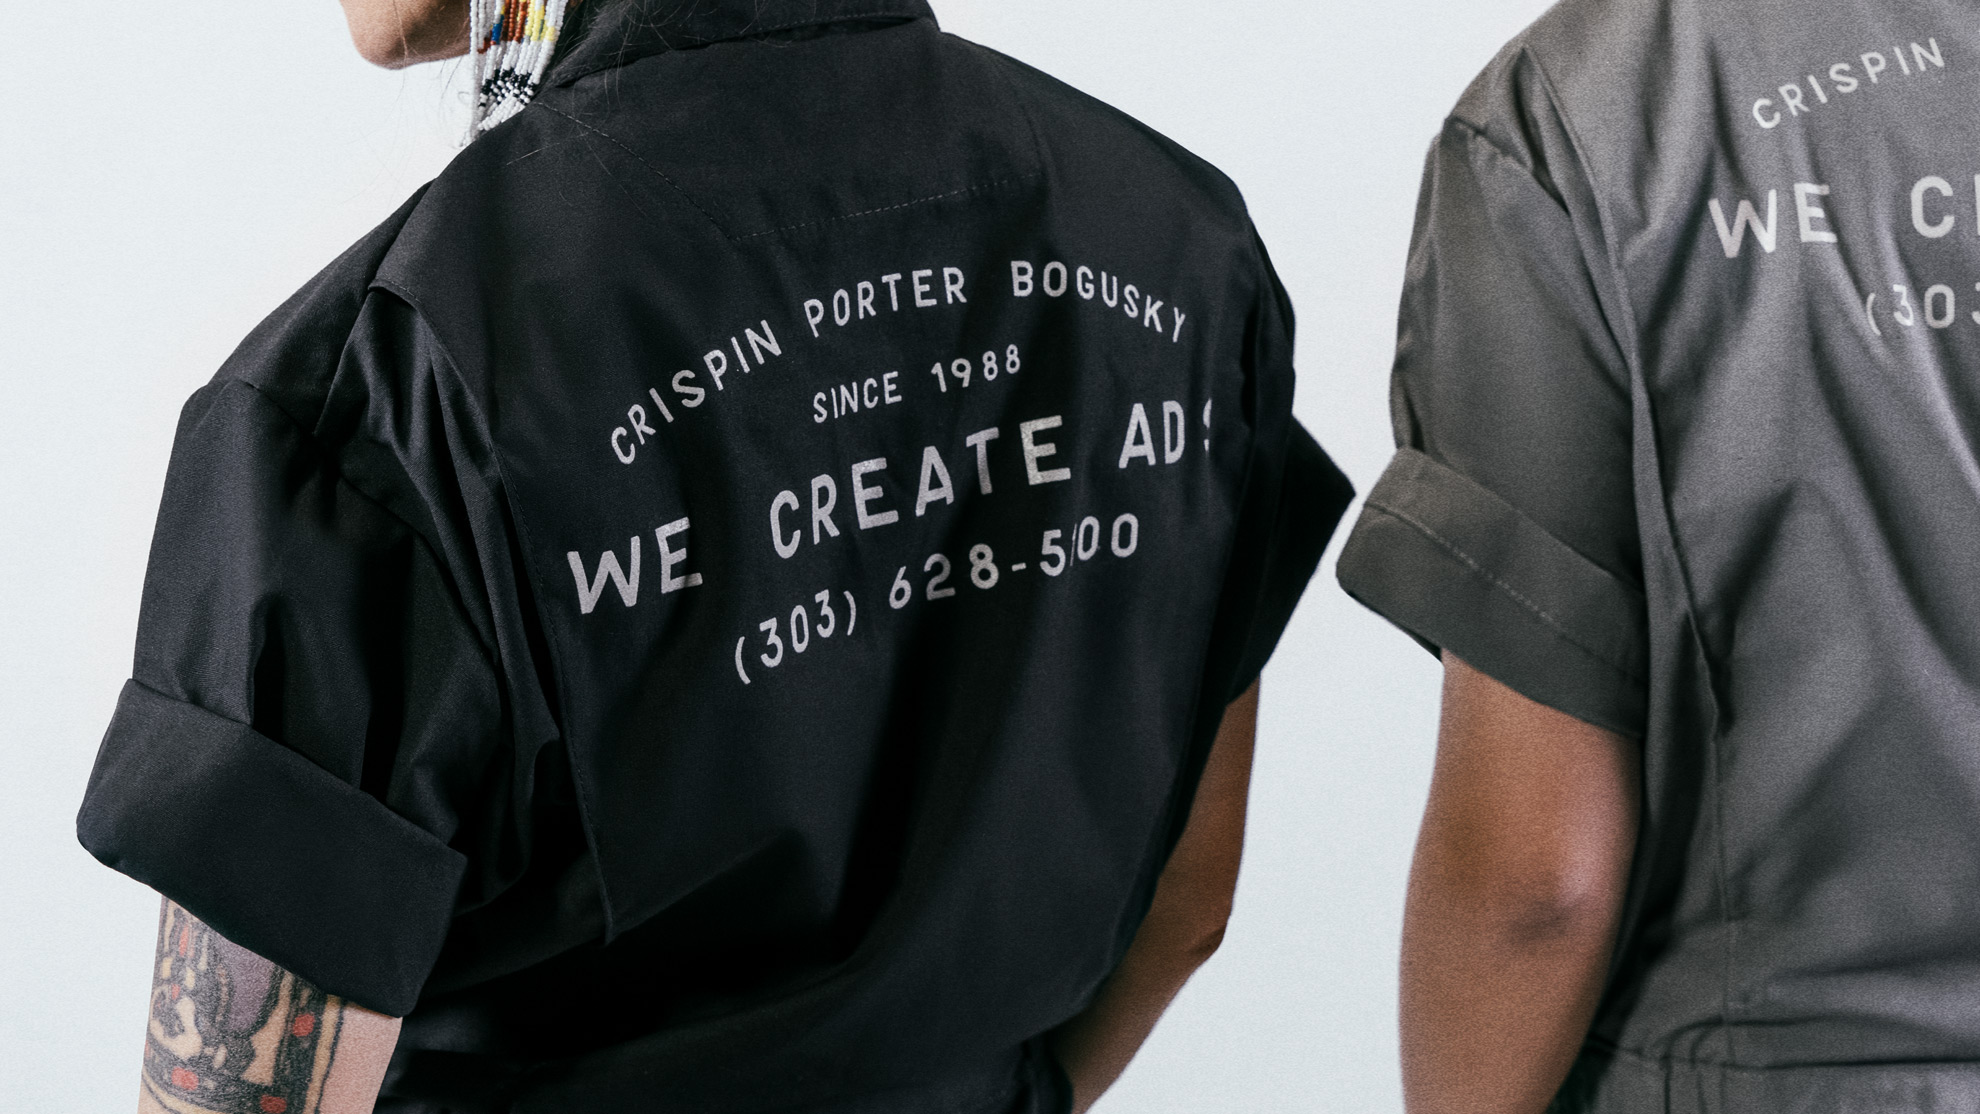 Crispin Porter Bogusky – Brand Identity